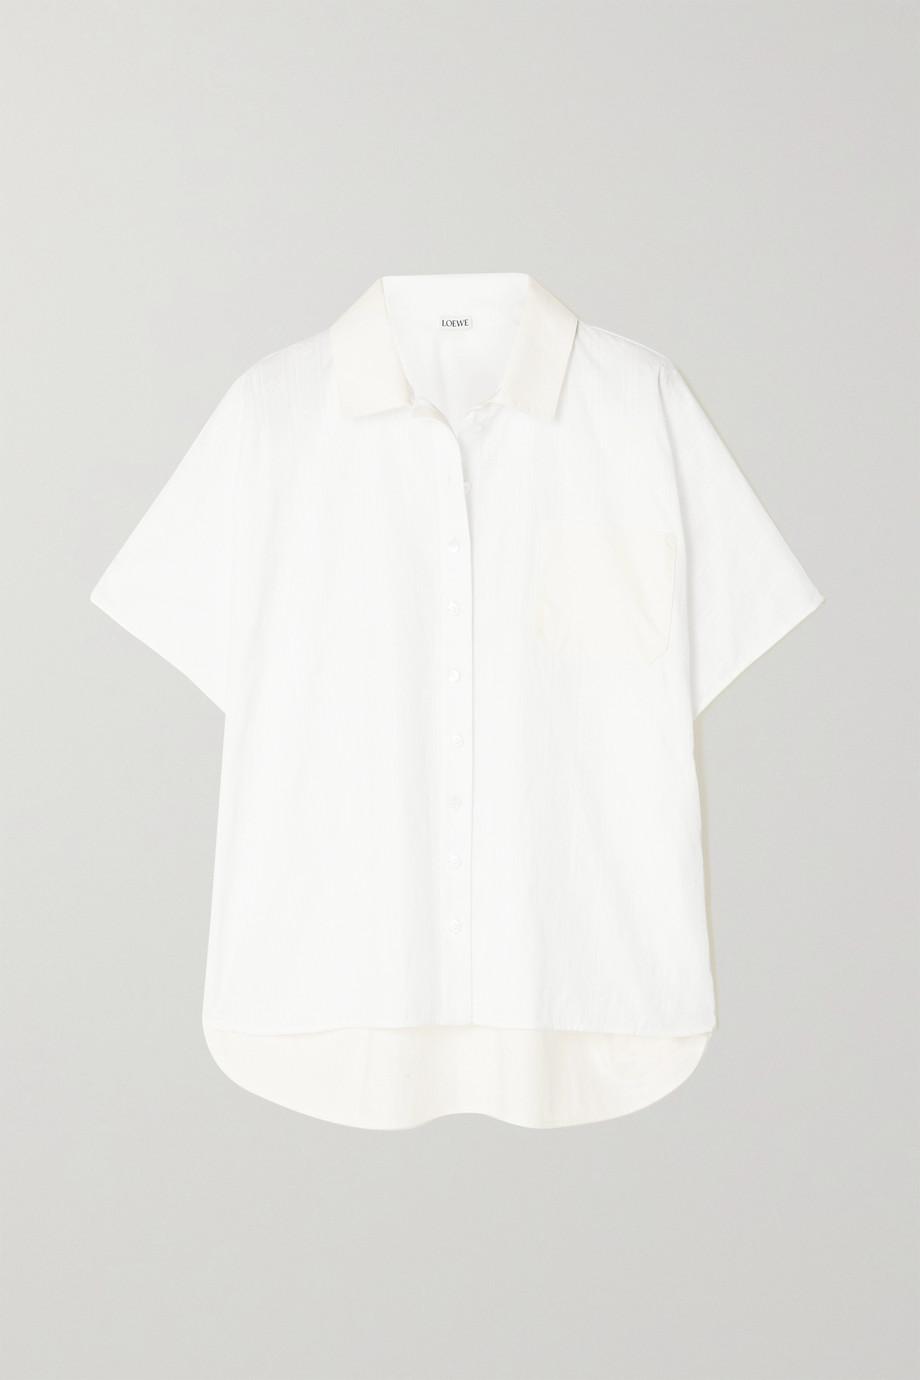 Loewe Embroidered cotton-poplin shirt